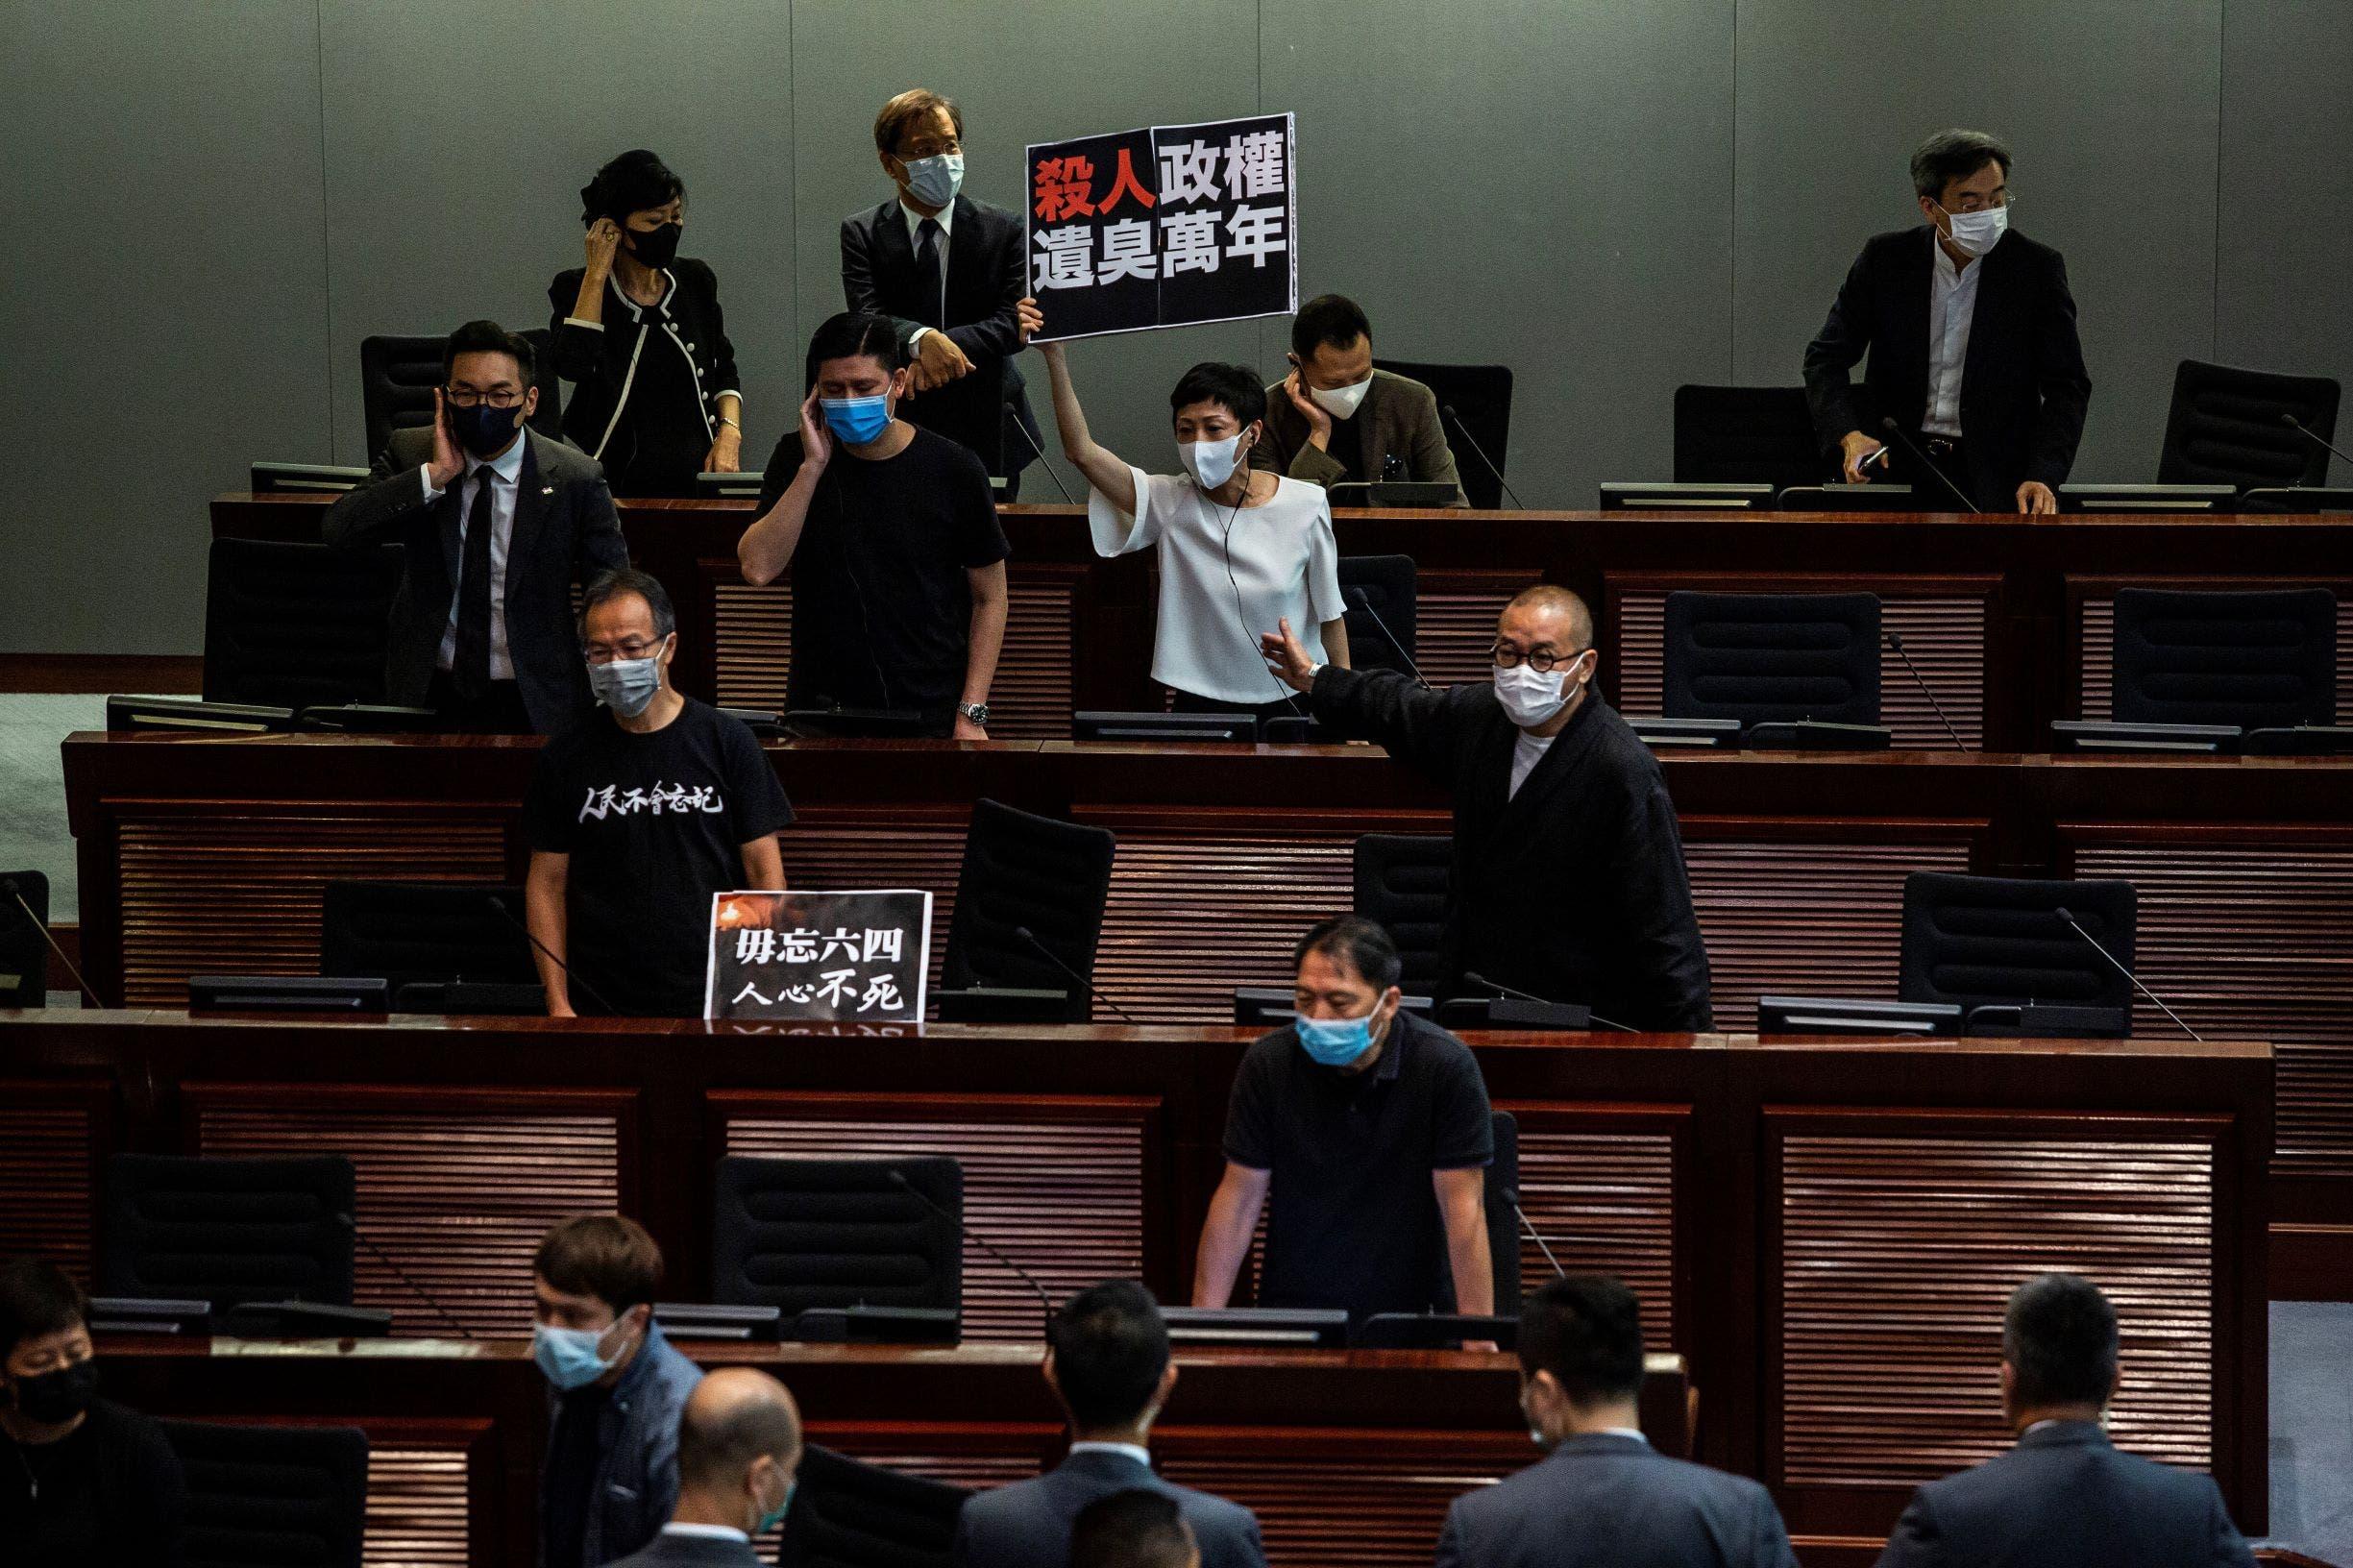 برلمان هونغ كونغ - فرانس برس